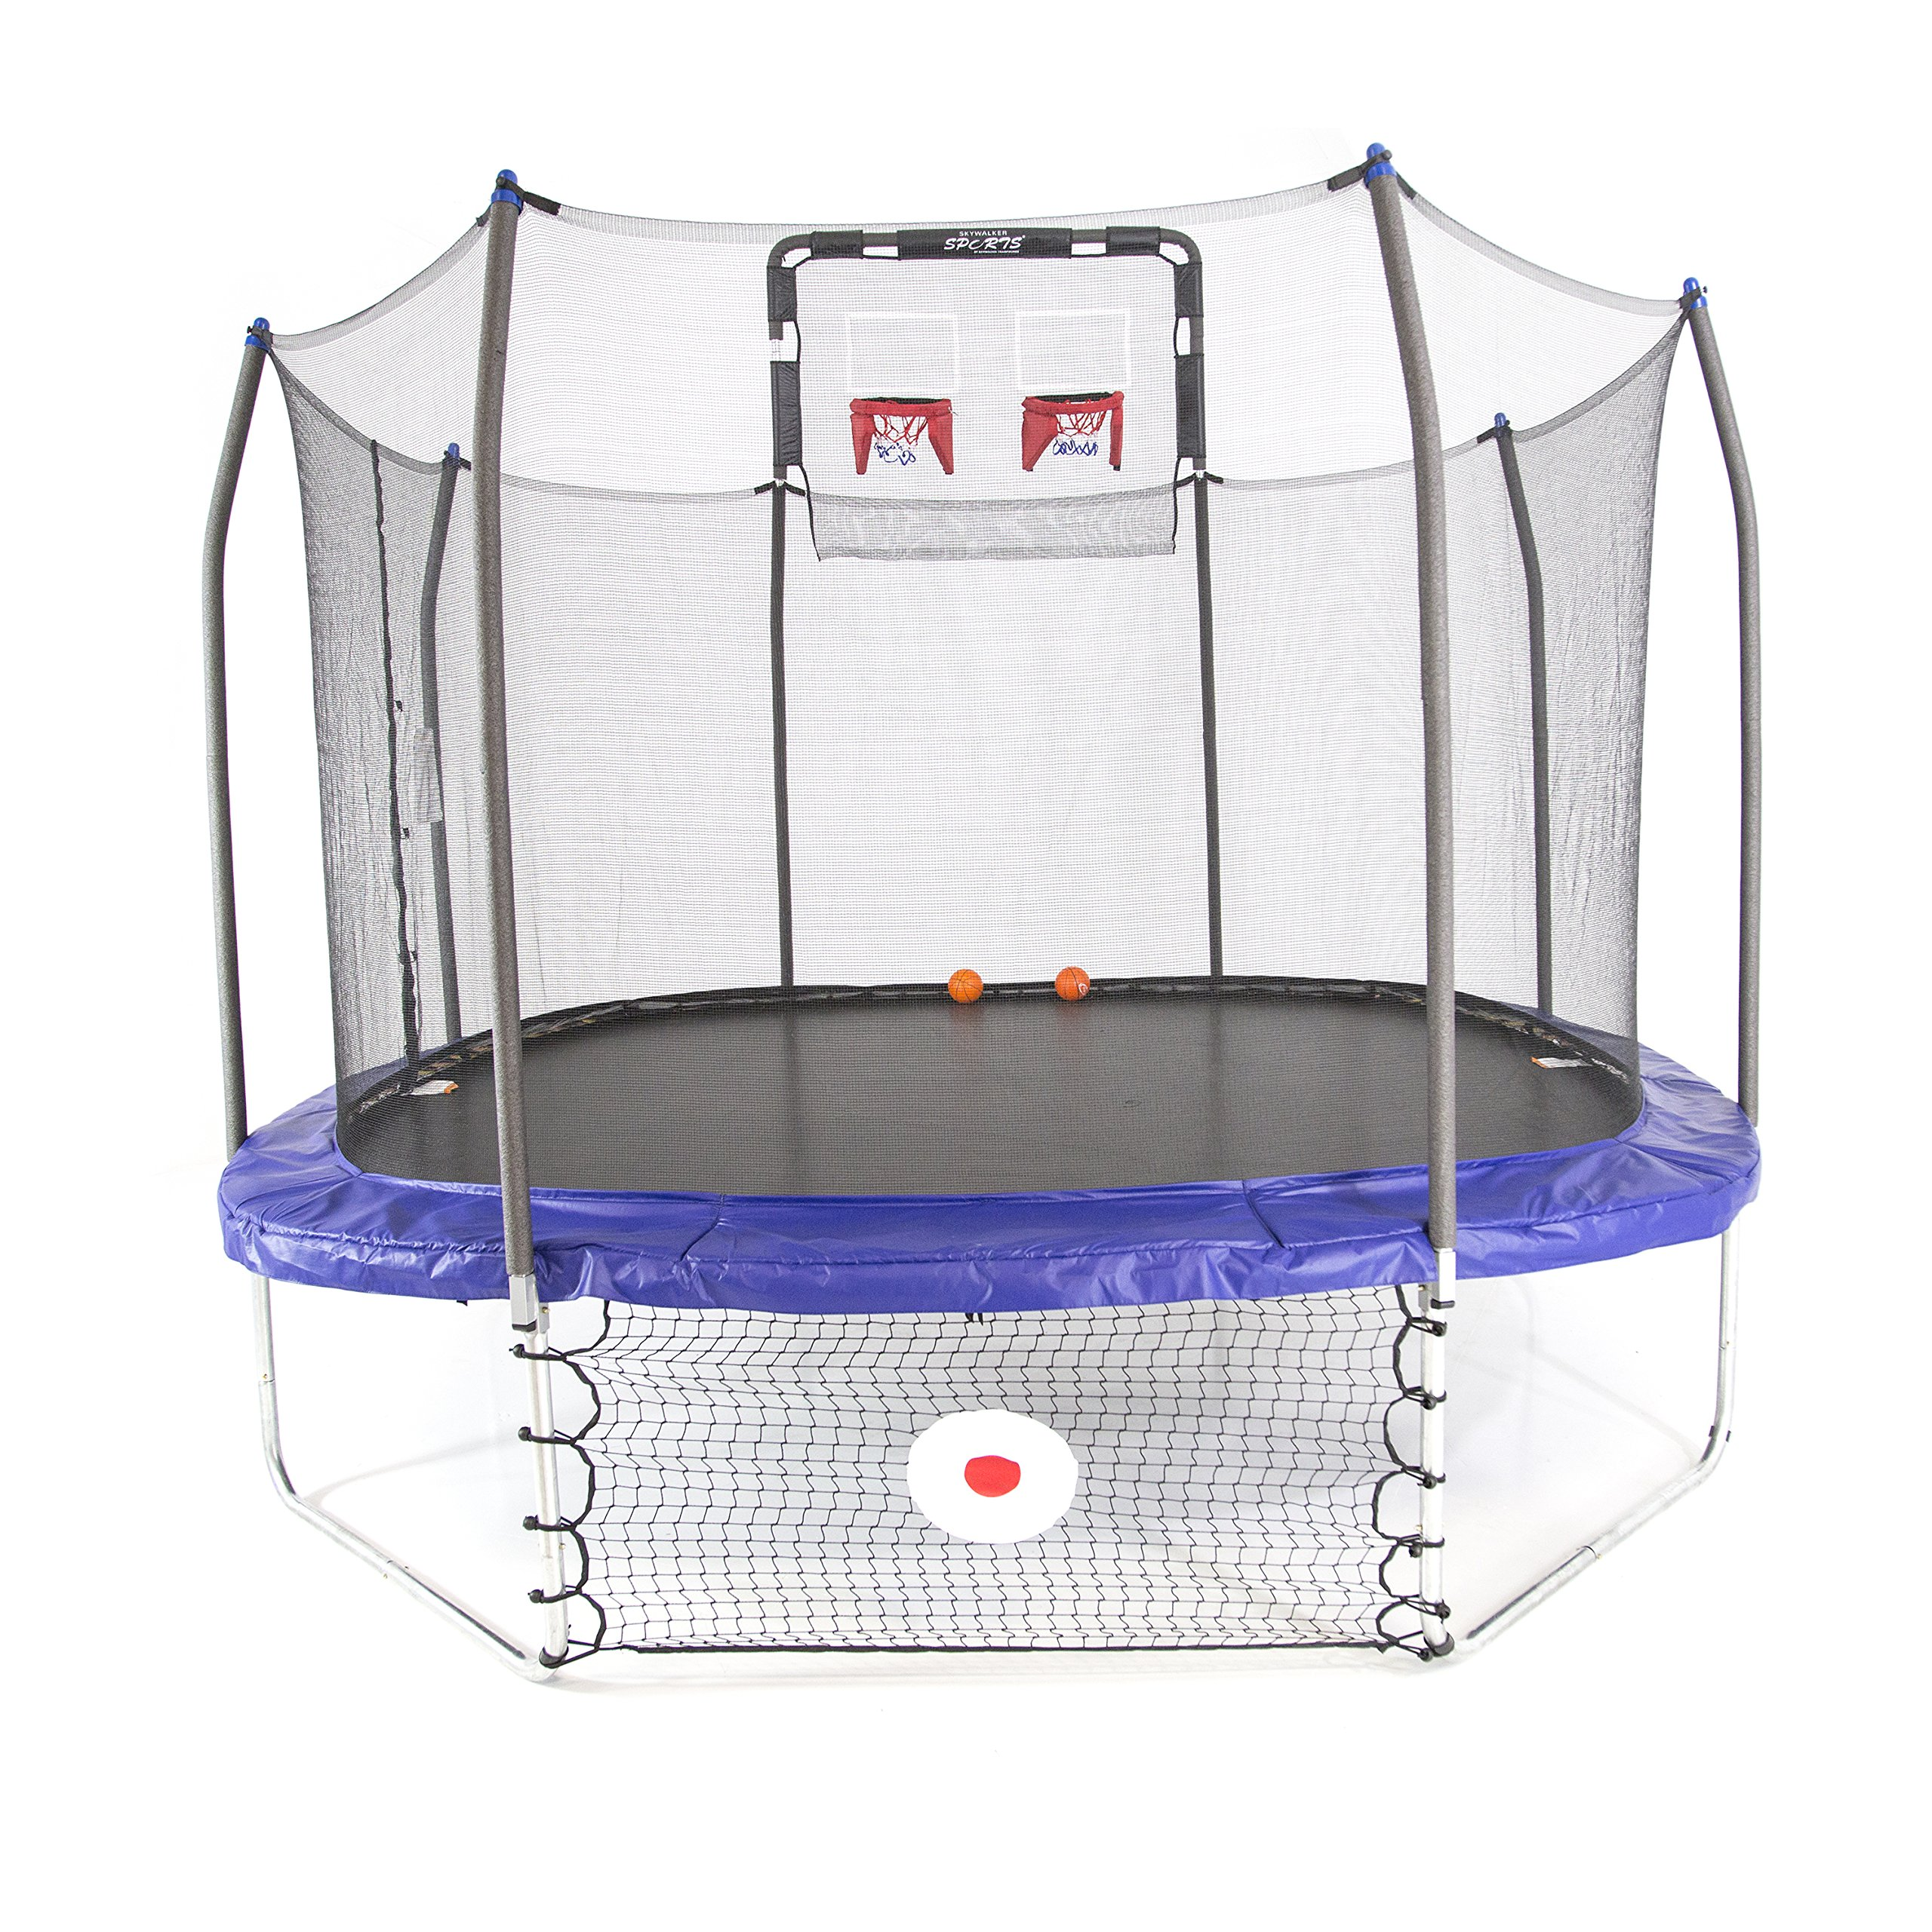 Skywalker Trampolines 12-Foot Square Trampoline with Enclosure - Soccer and Basketball Trampoline by Skywalker Trampolines